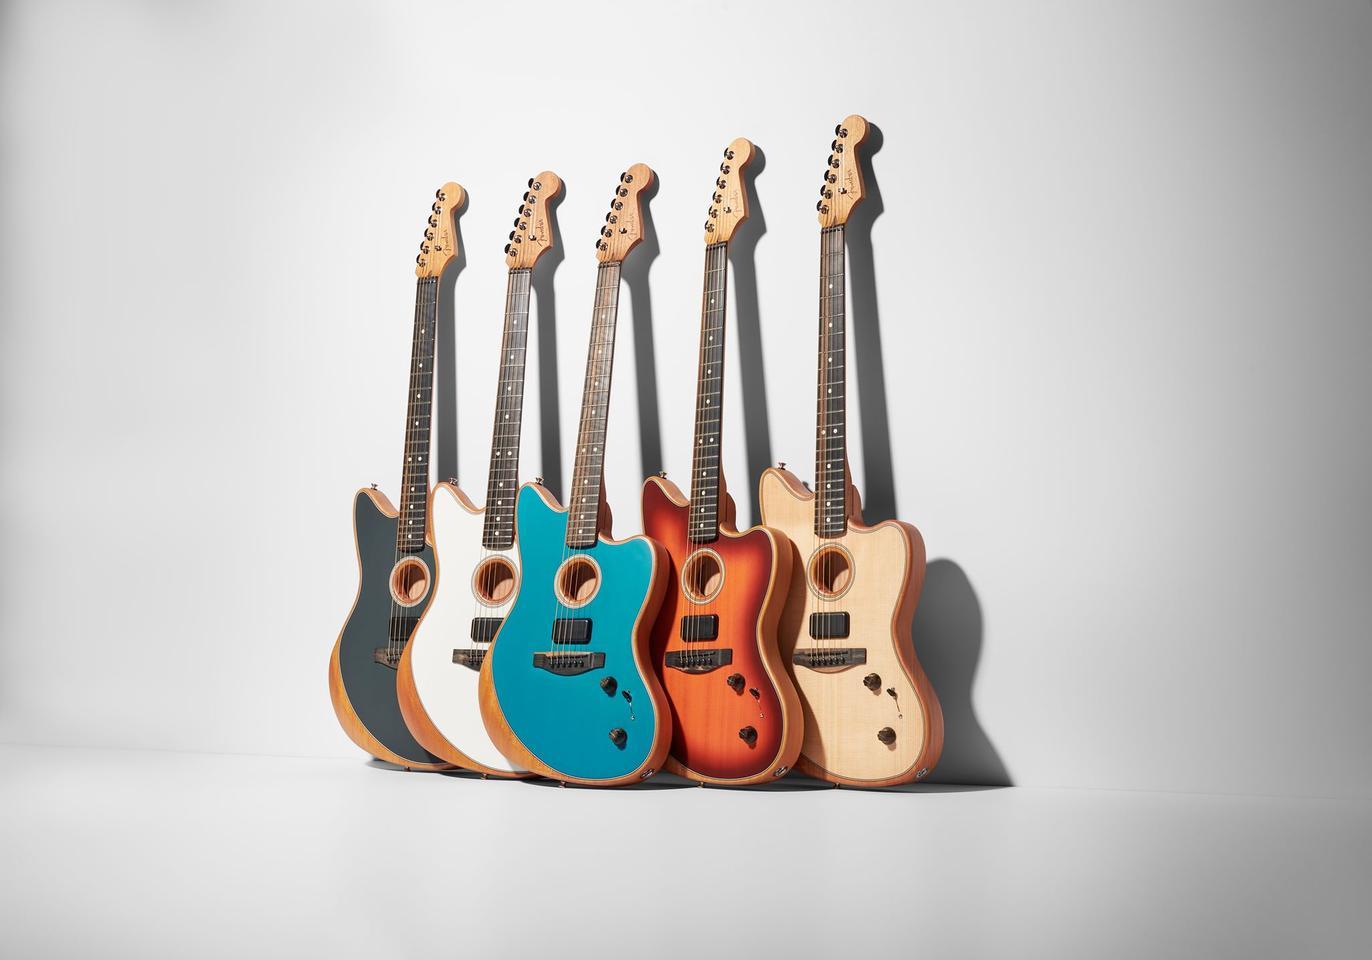 The five-finish range of the standard Acoustasonic Jazzmaster guitars